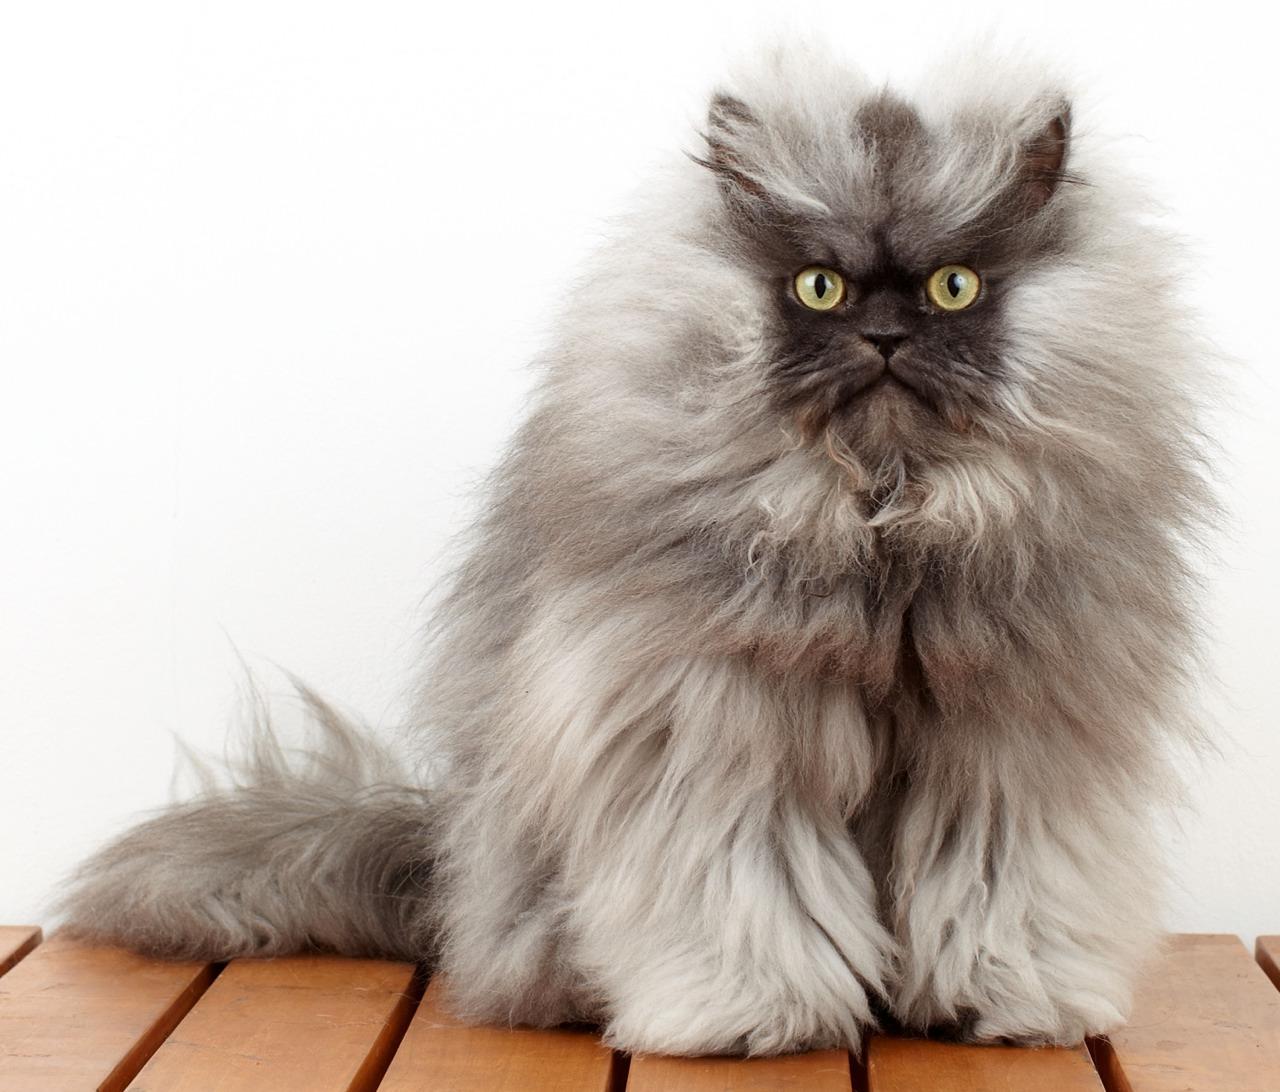 Colonel Meow 1